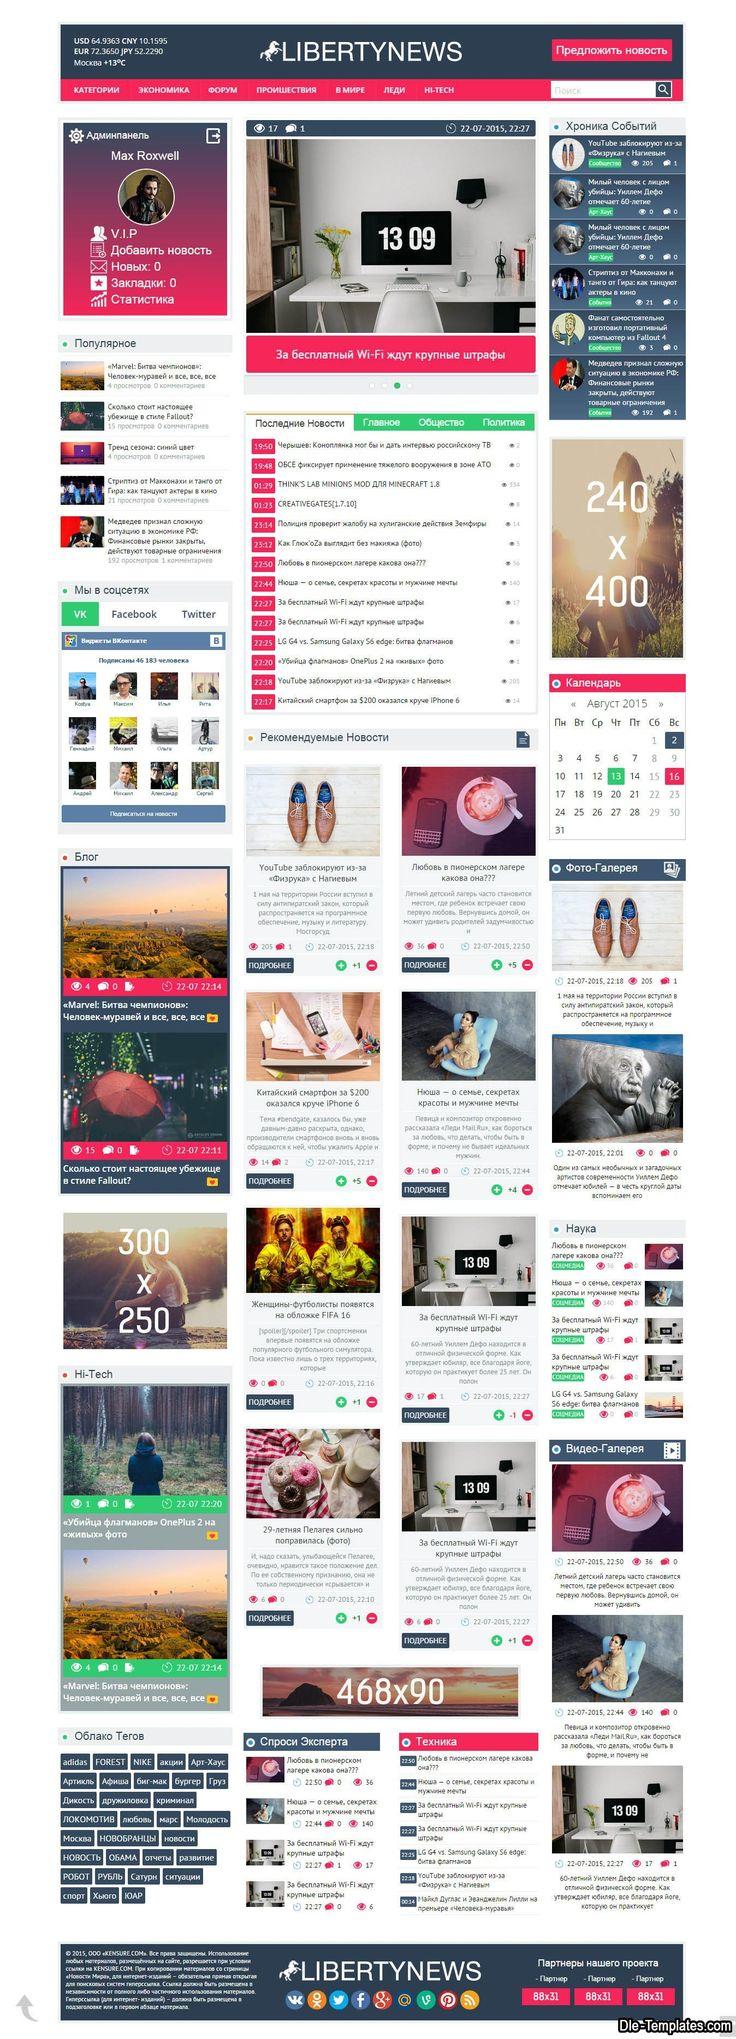 LibertyNews - адаптивный шаблон в стиле flat для DLE #templates #website #шаблон #сайт #web